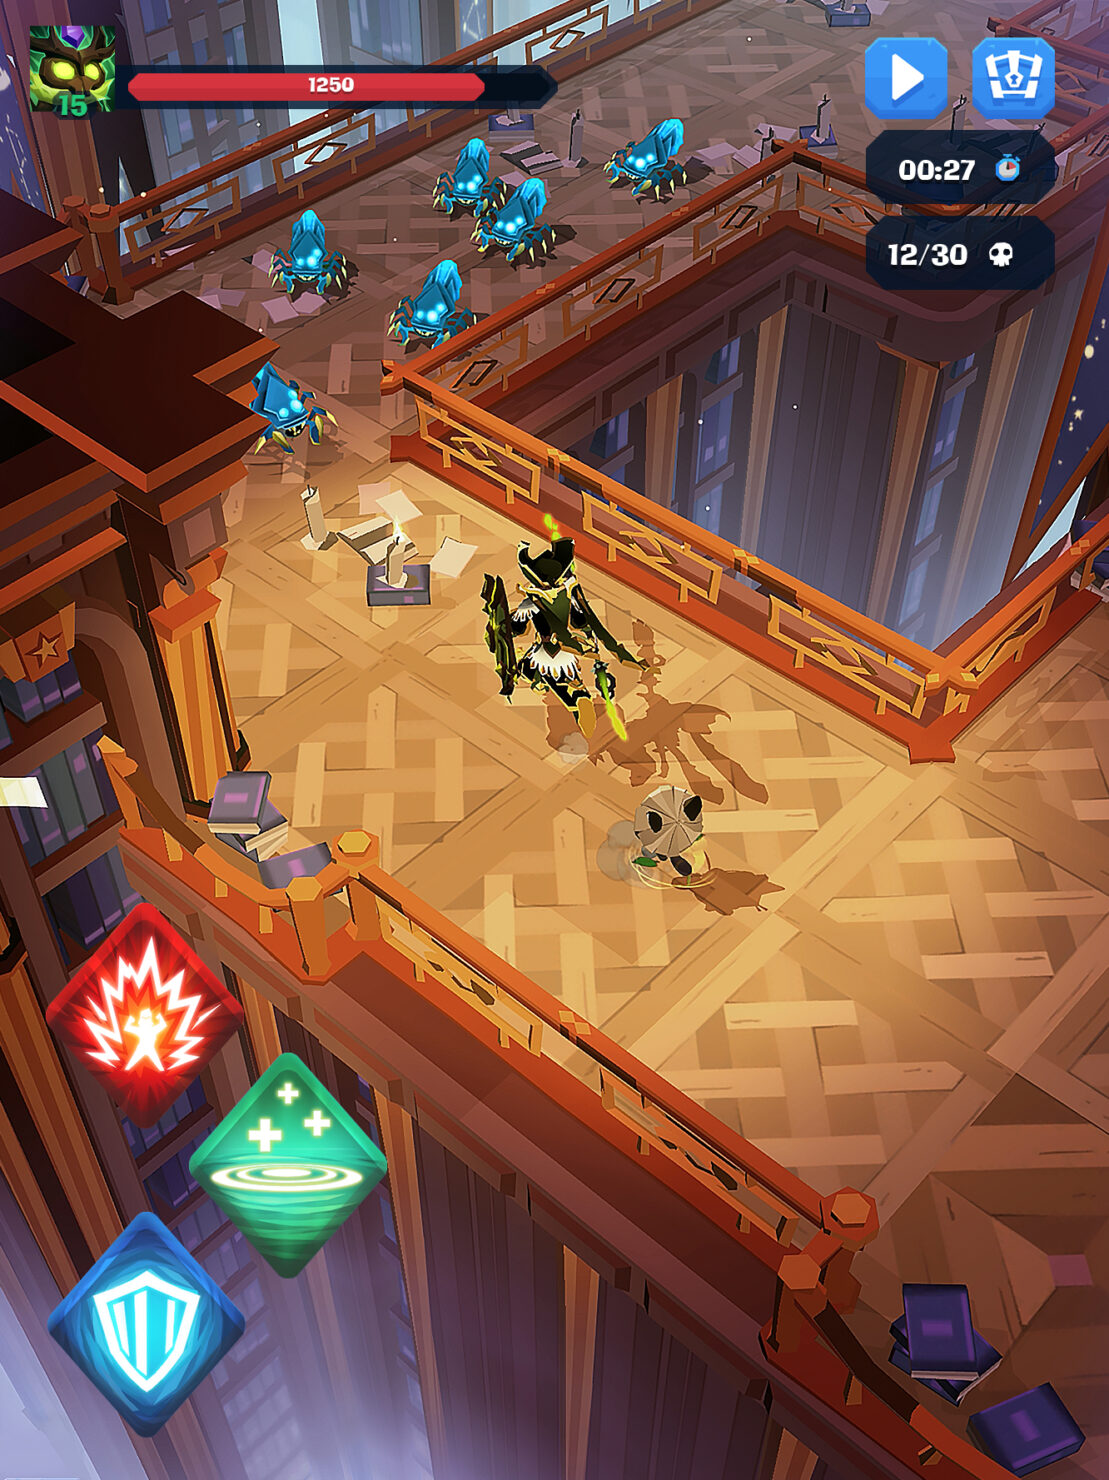 mq_screenshot_fight-gameplay-earth-castle_en-jpg